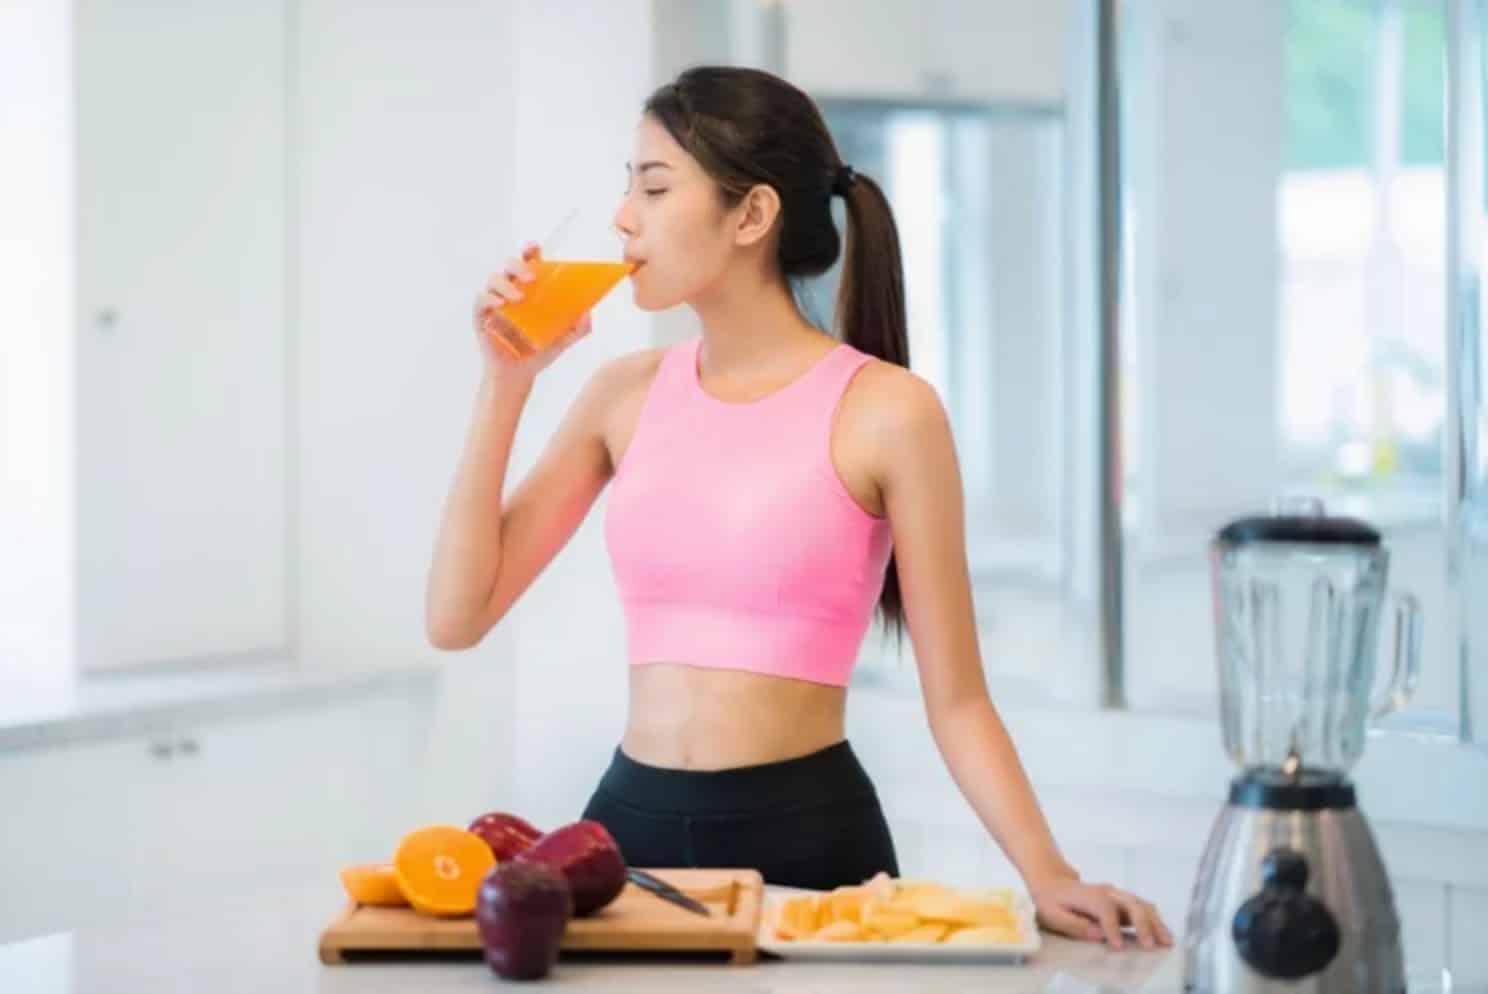 Women's Health & Wellness Issues